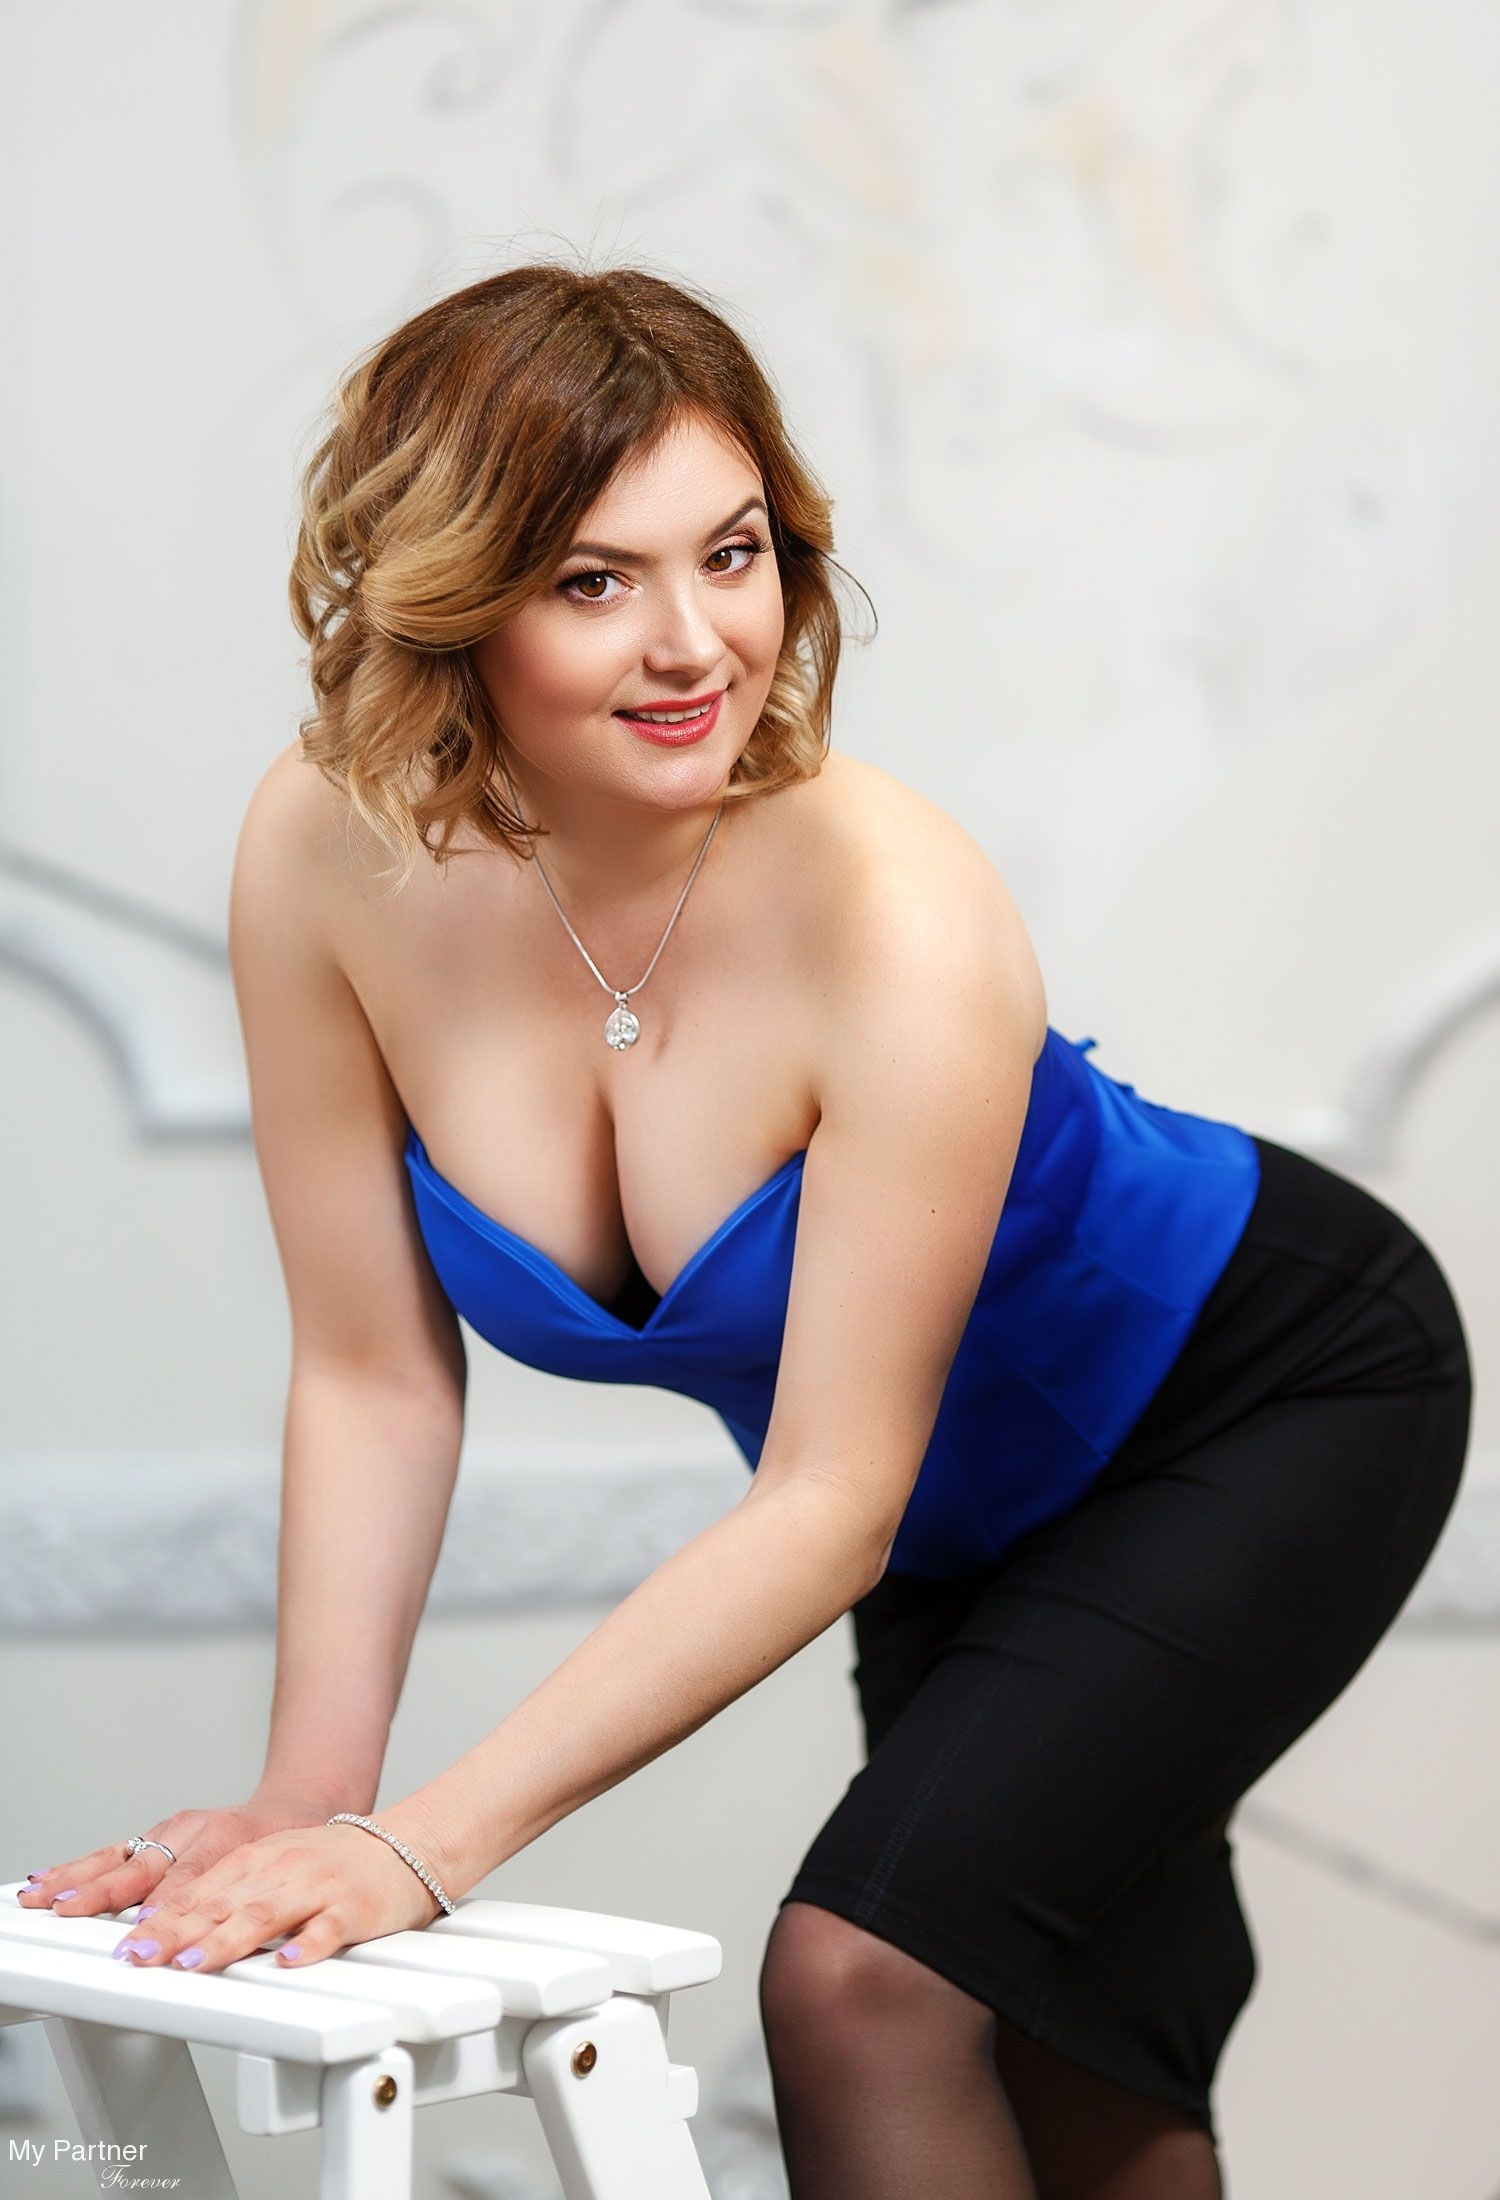 meet girls from ukraine